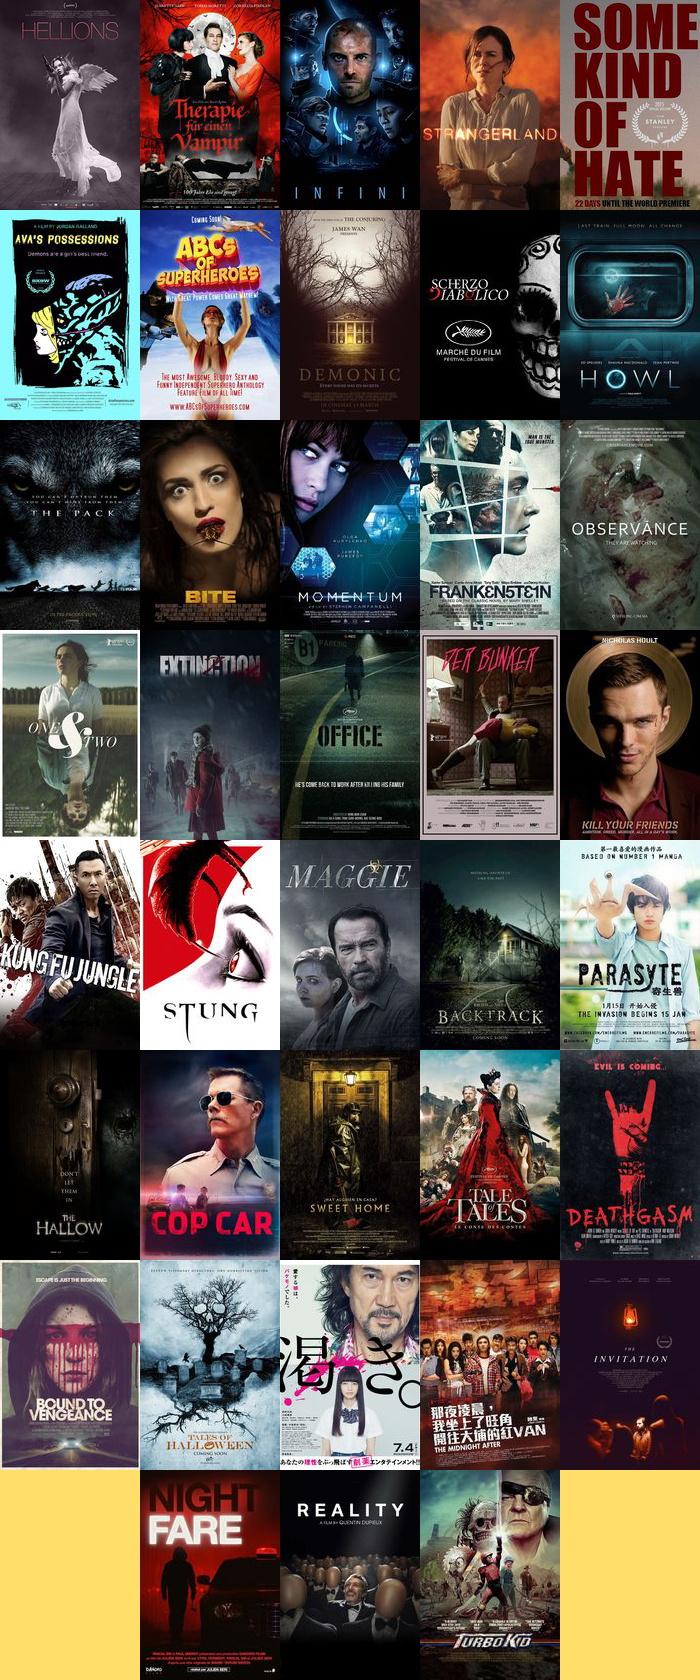 Fantasy Filmfest 2015 - Fantasy Filmfest 2015 - Tag #13